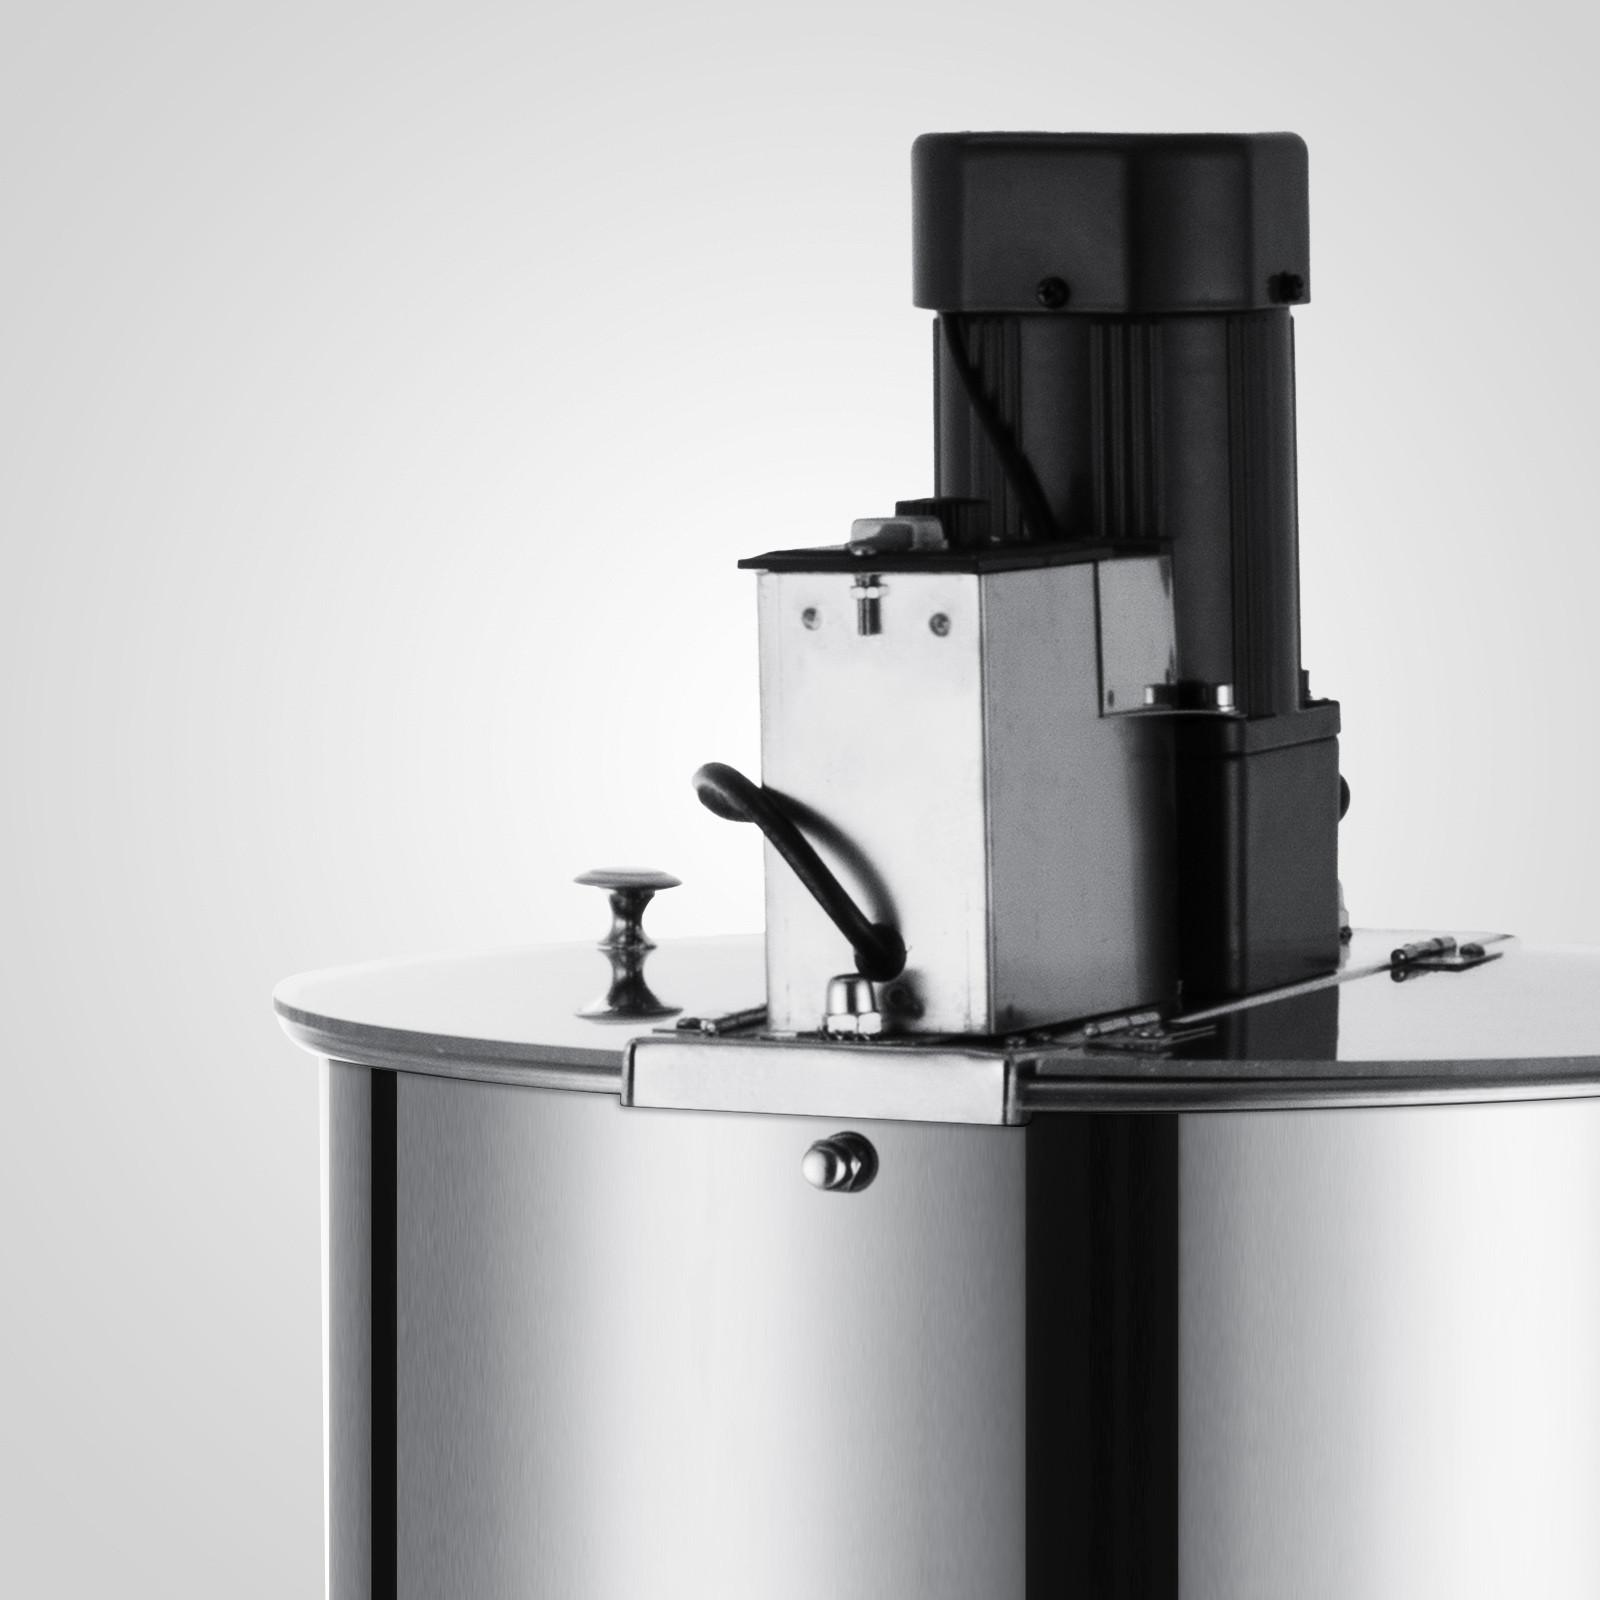 Extracteur-de-Miel-Electrique-manuelle-2-3-4-Cadres-En-Acier-Inox-Centrifugeuse miniature 72